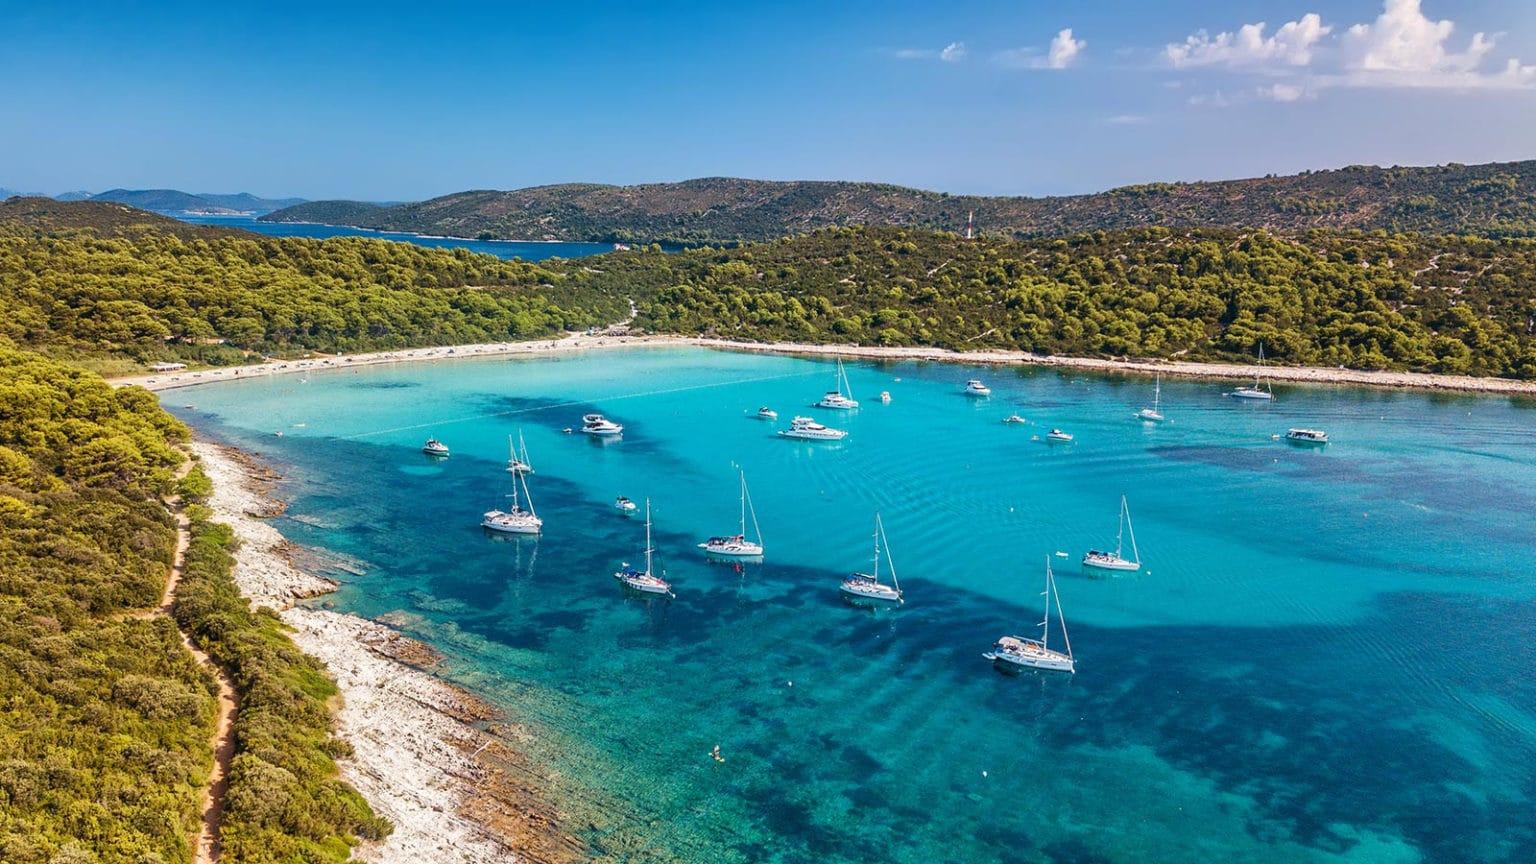 zadaras zadar kroatija sakarun papludimys